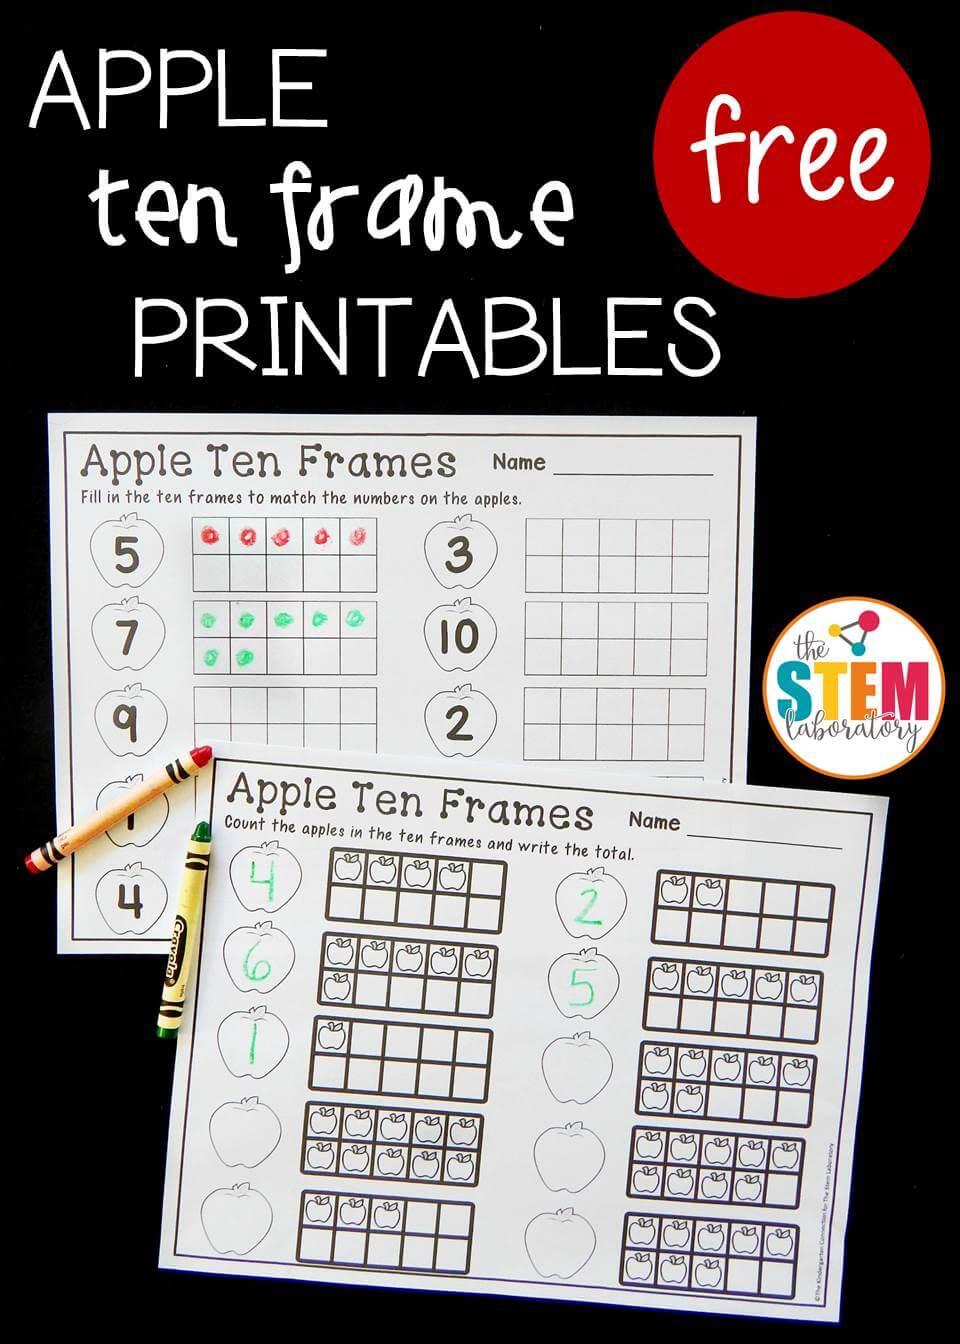 Apple Ten Frame Printables The Stem Laboratory